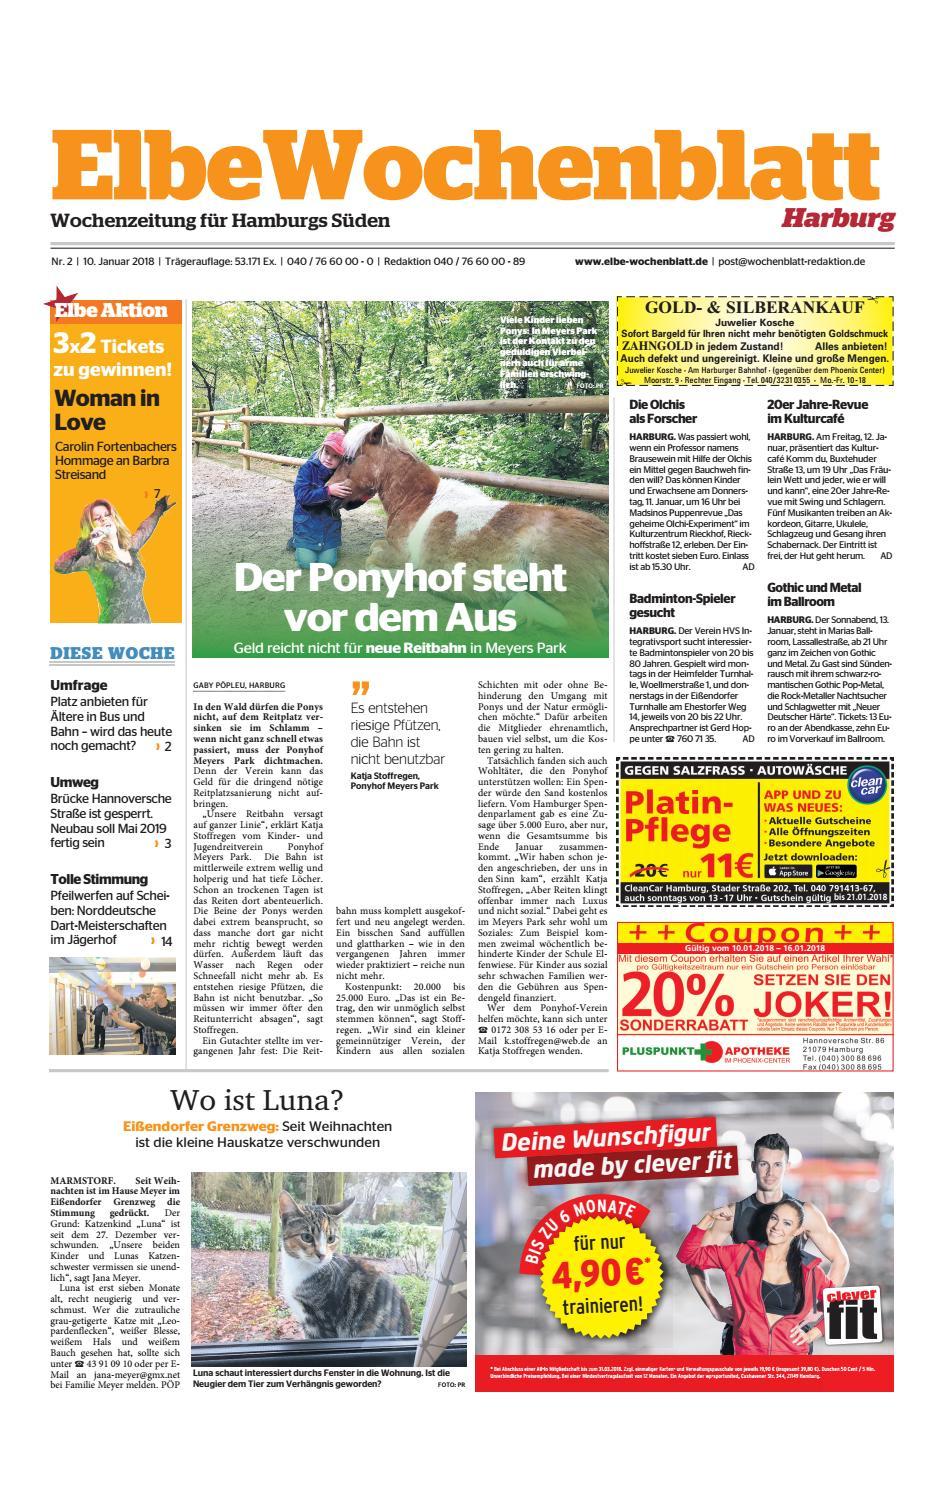 Harburg KW02 2018 by Elbe Wochenblatt Verlagsgesellschaft mbH & Co KG issuu